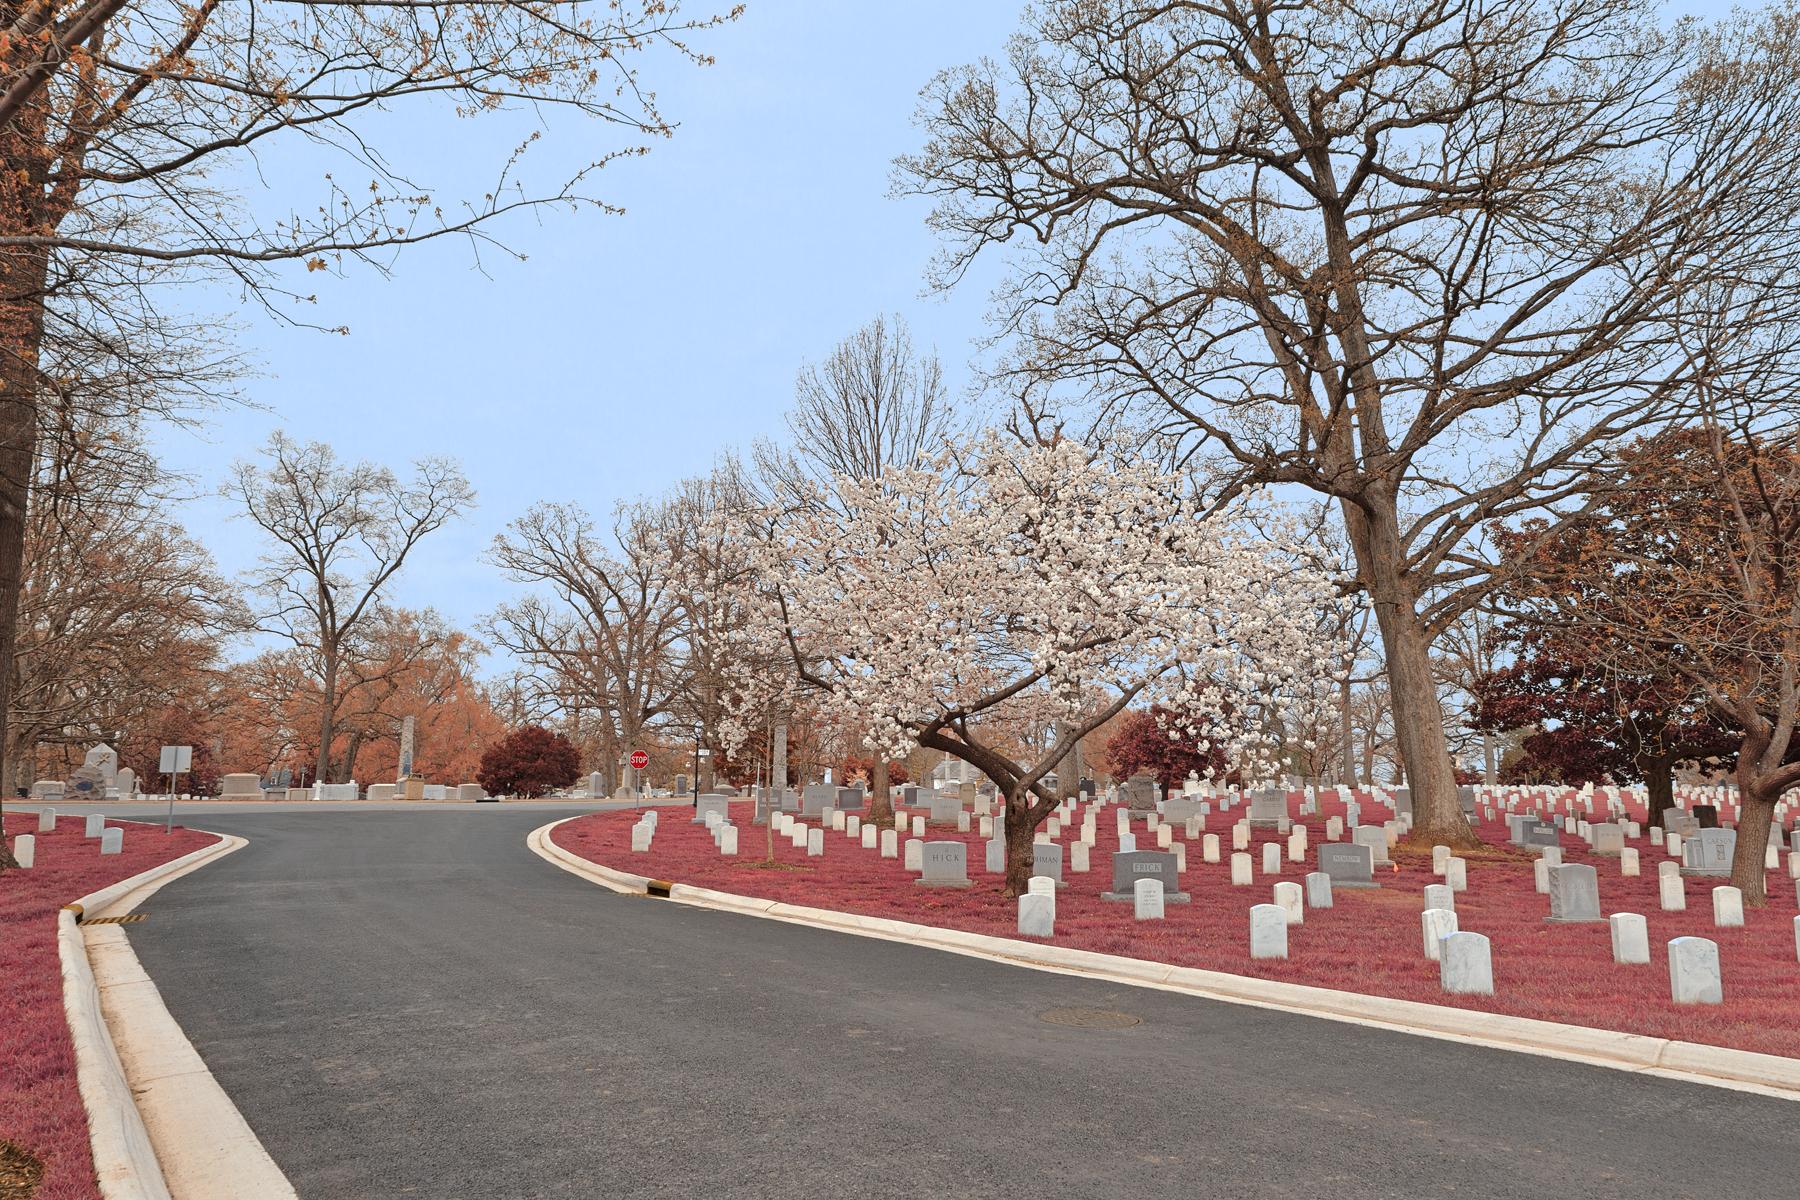 Arlington Cemetery Road - Cerise Pink HDR, America, Quiet, Serrulata, Serenity, HQ Photo